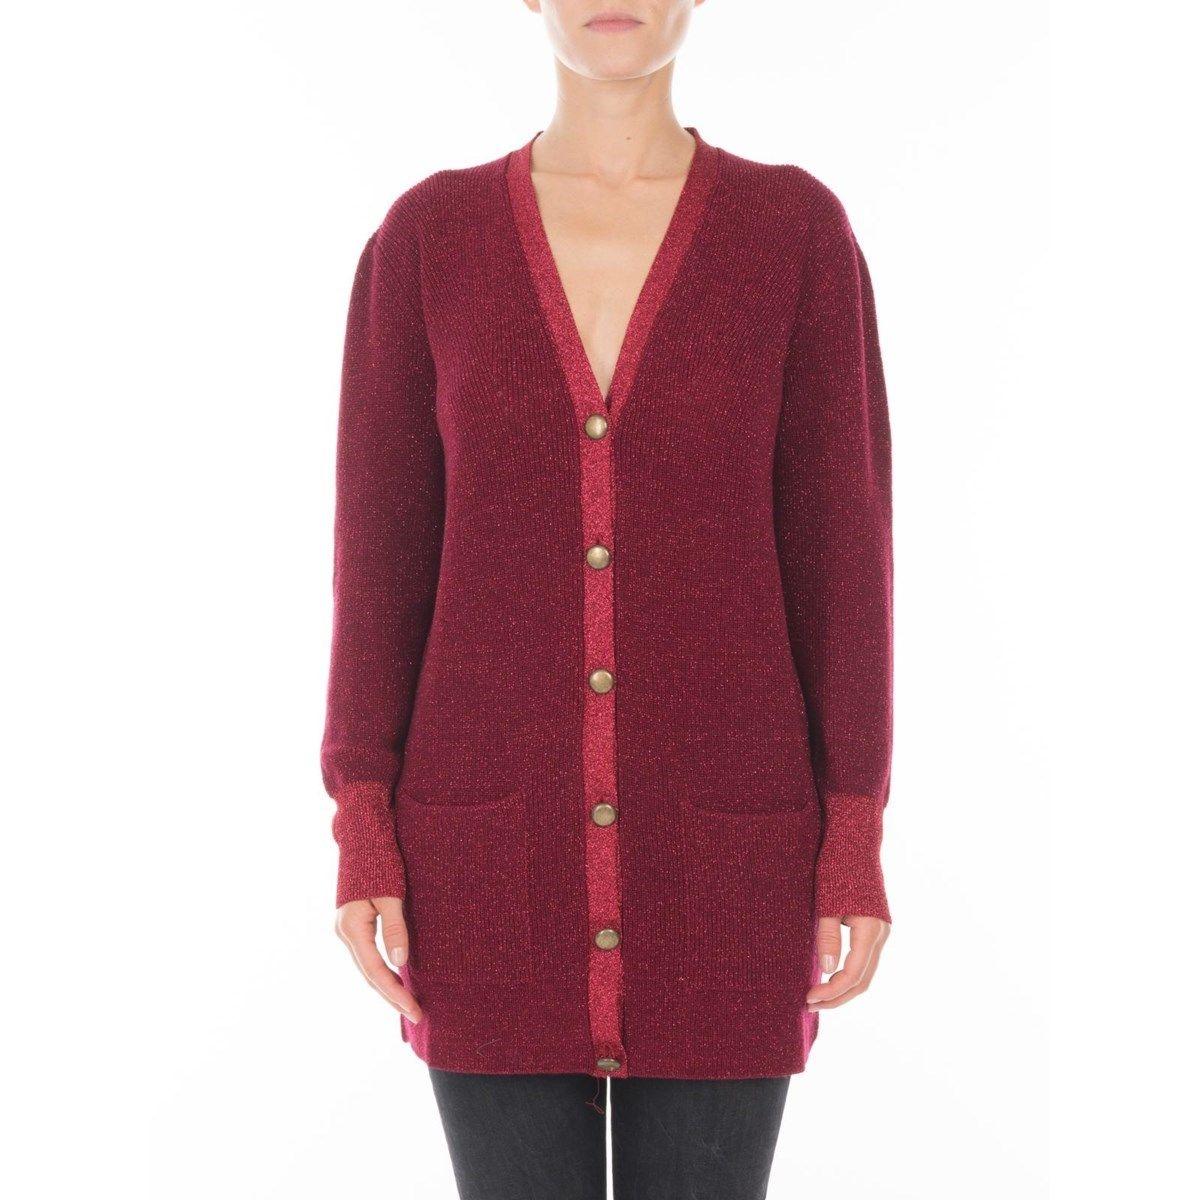 Cardigan en laine Merinos et maille Fil textile Picadilly